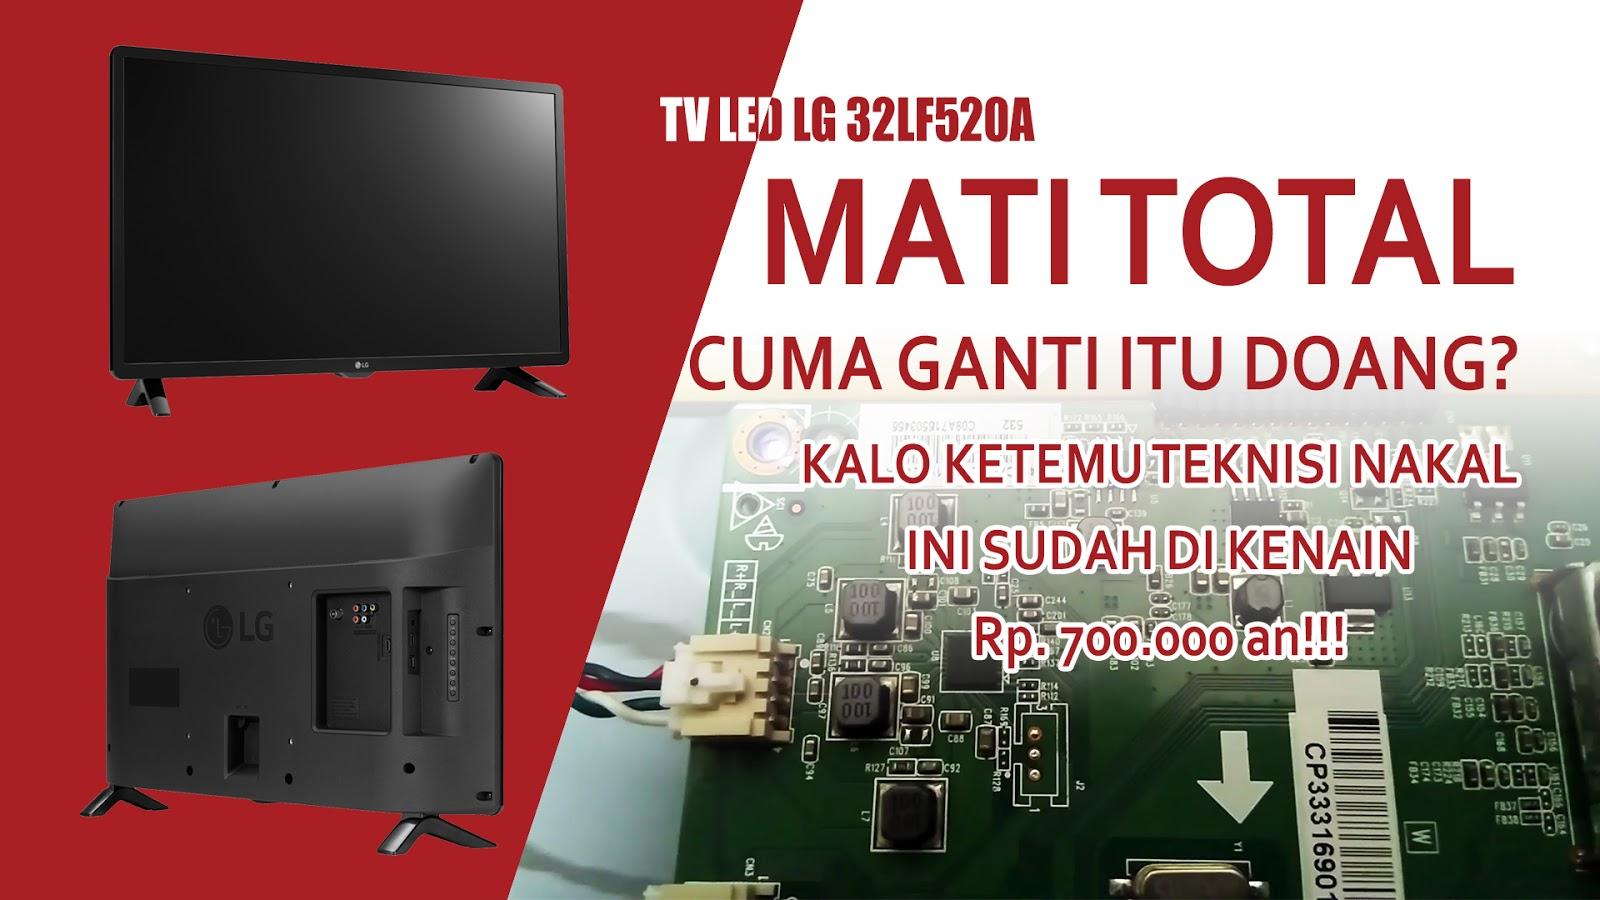 Cara Memperbaiki TV LED LG 32LF520A Mati Total